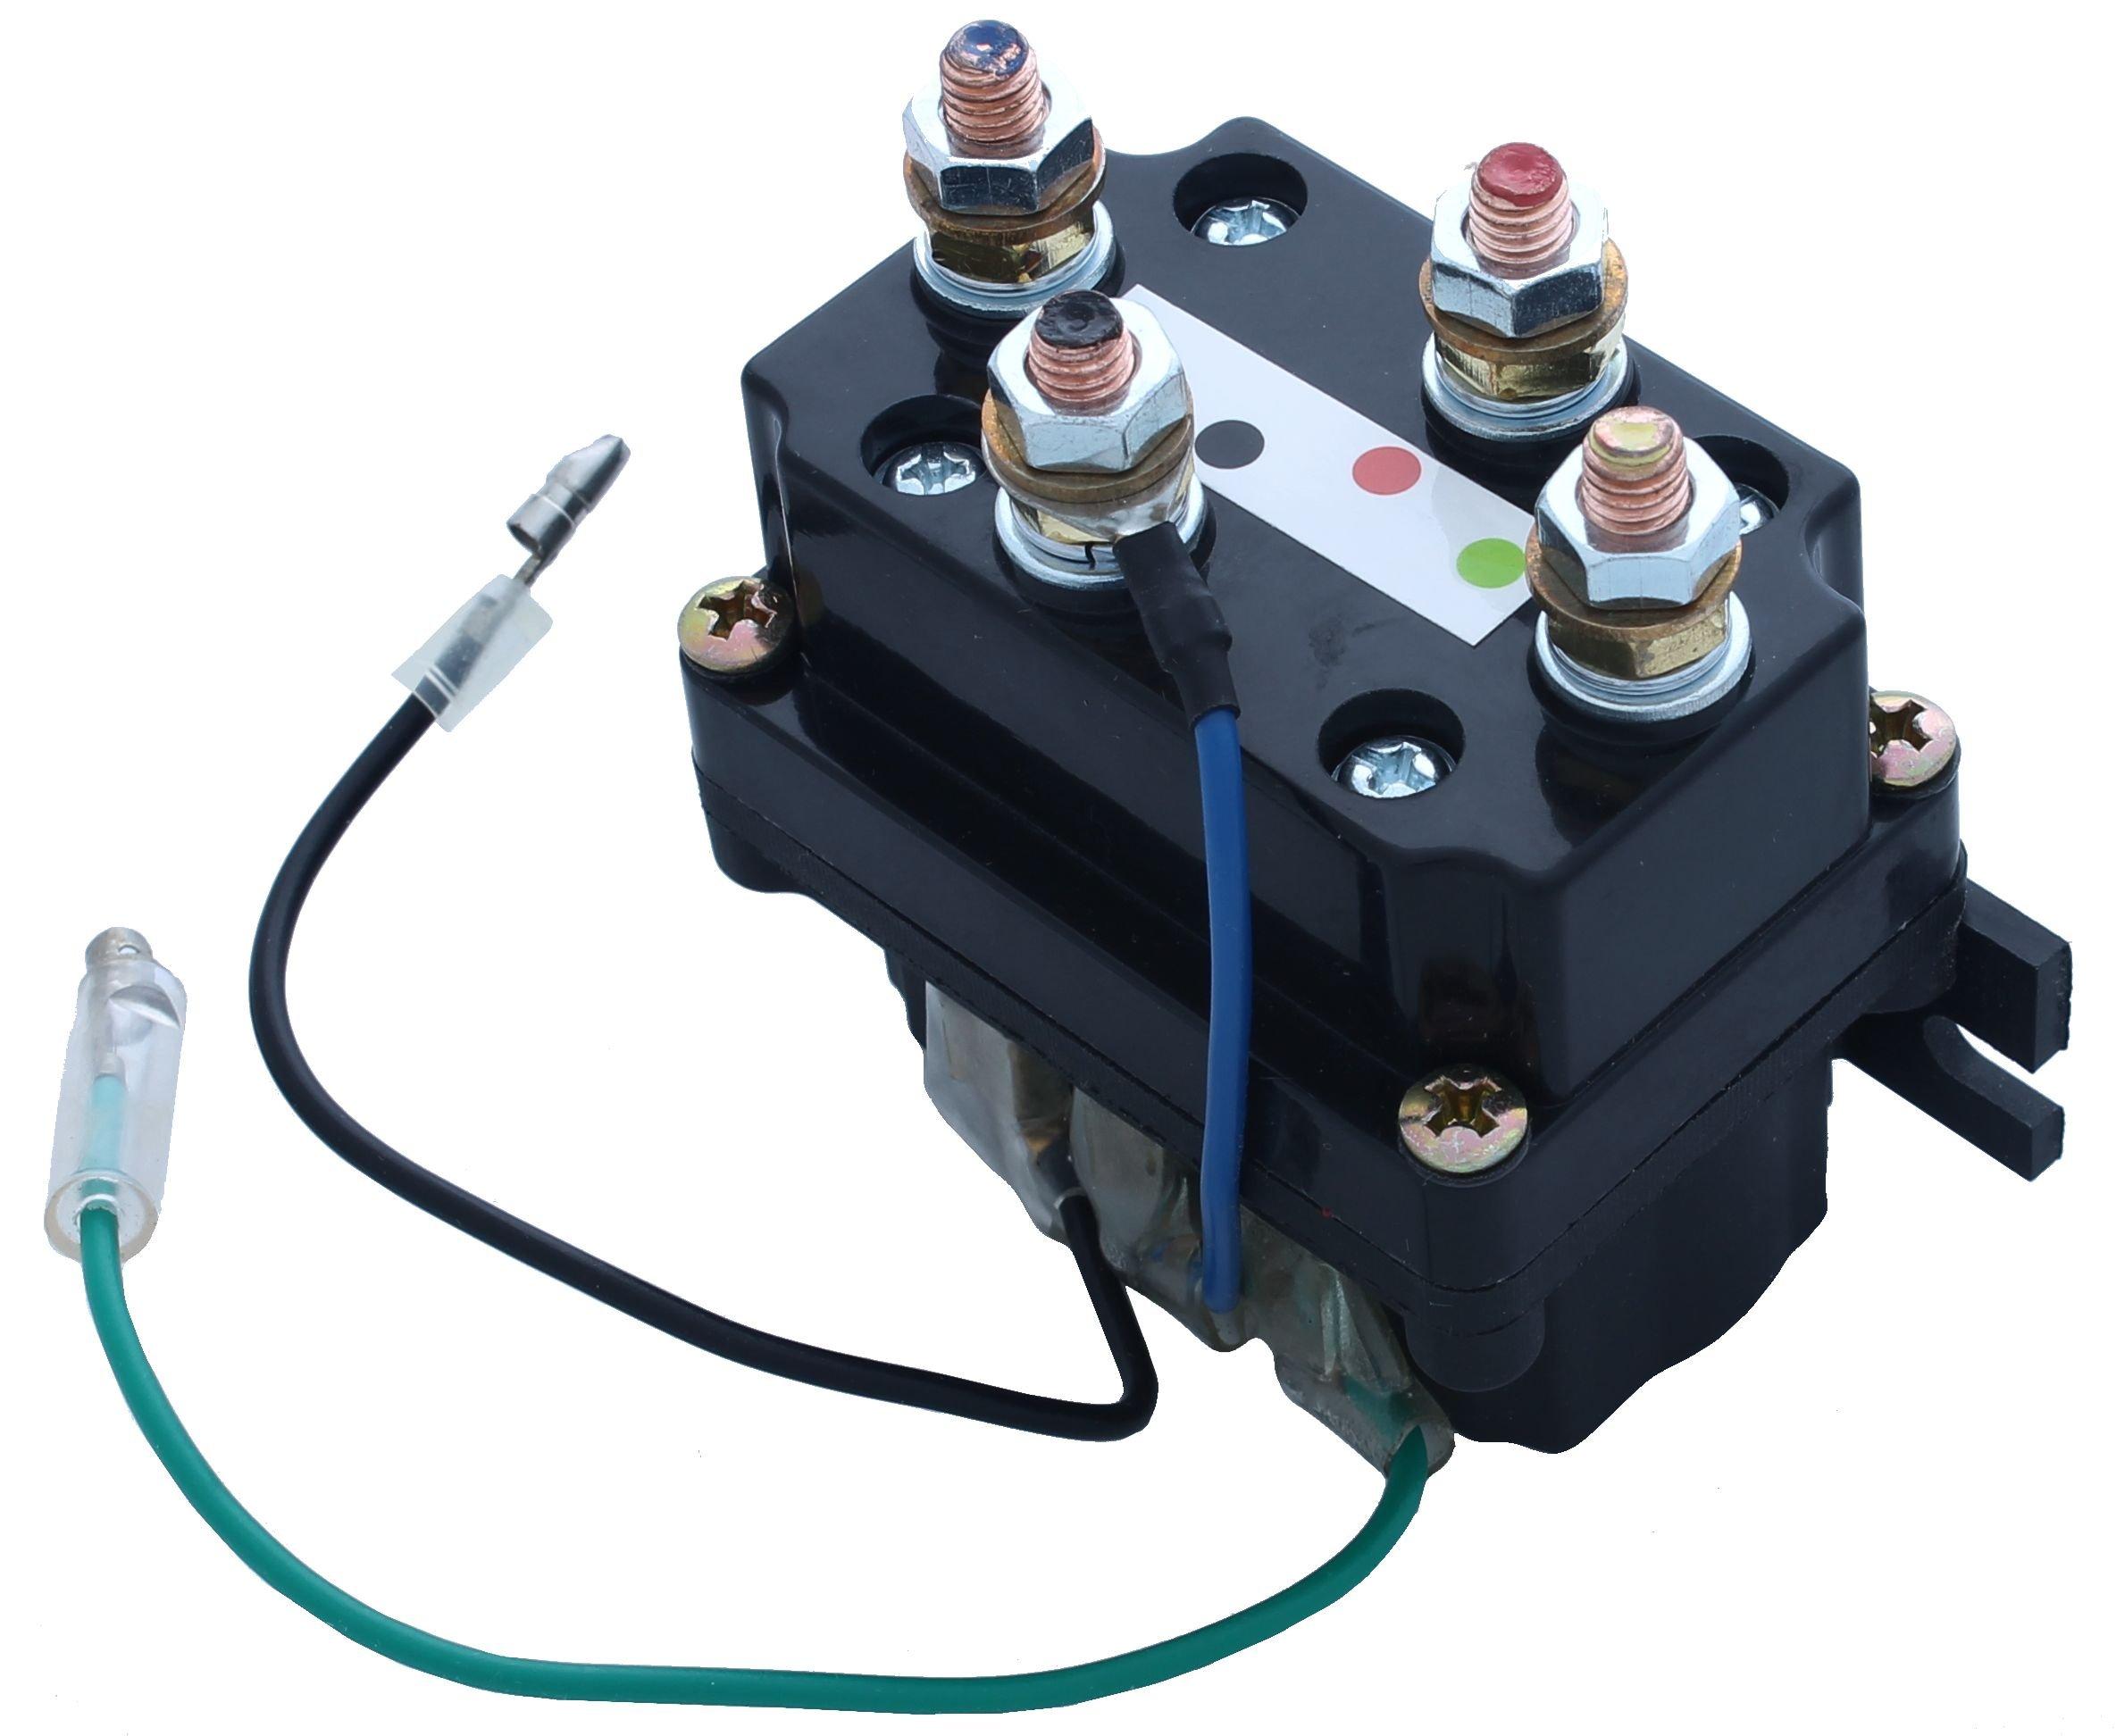 VIPER ATV/UTV Replacement Contactor/Solenoid 1500lb-5000lb Winches by MotoAlliance